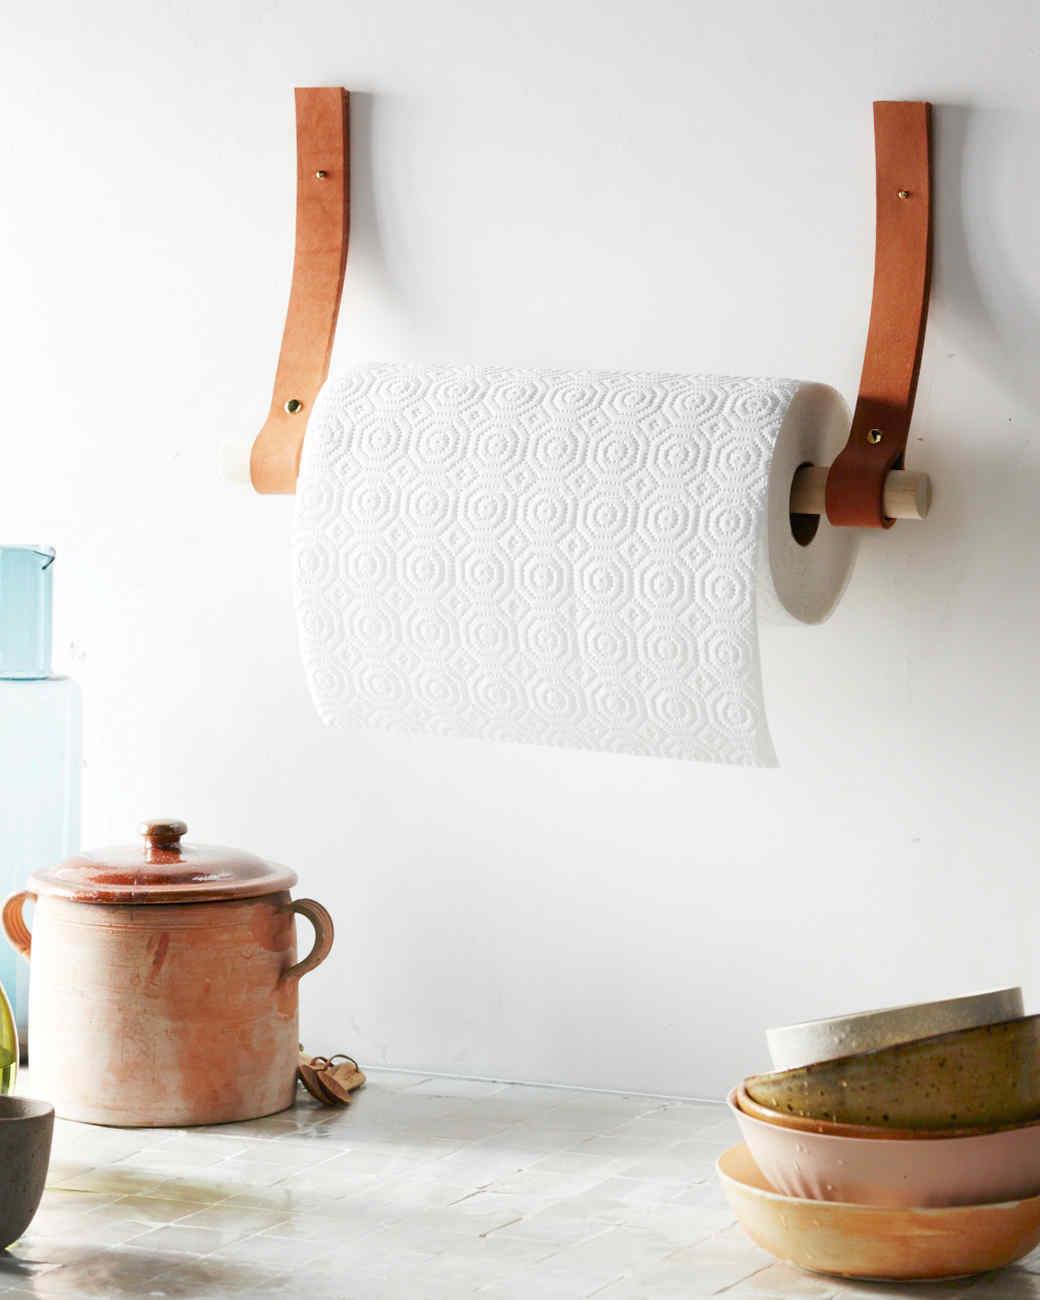 paper-towel-0265-d111284-0914.jpg